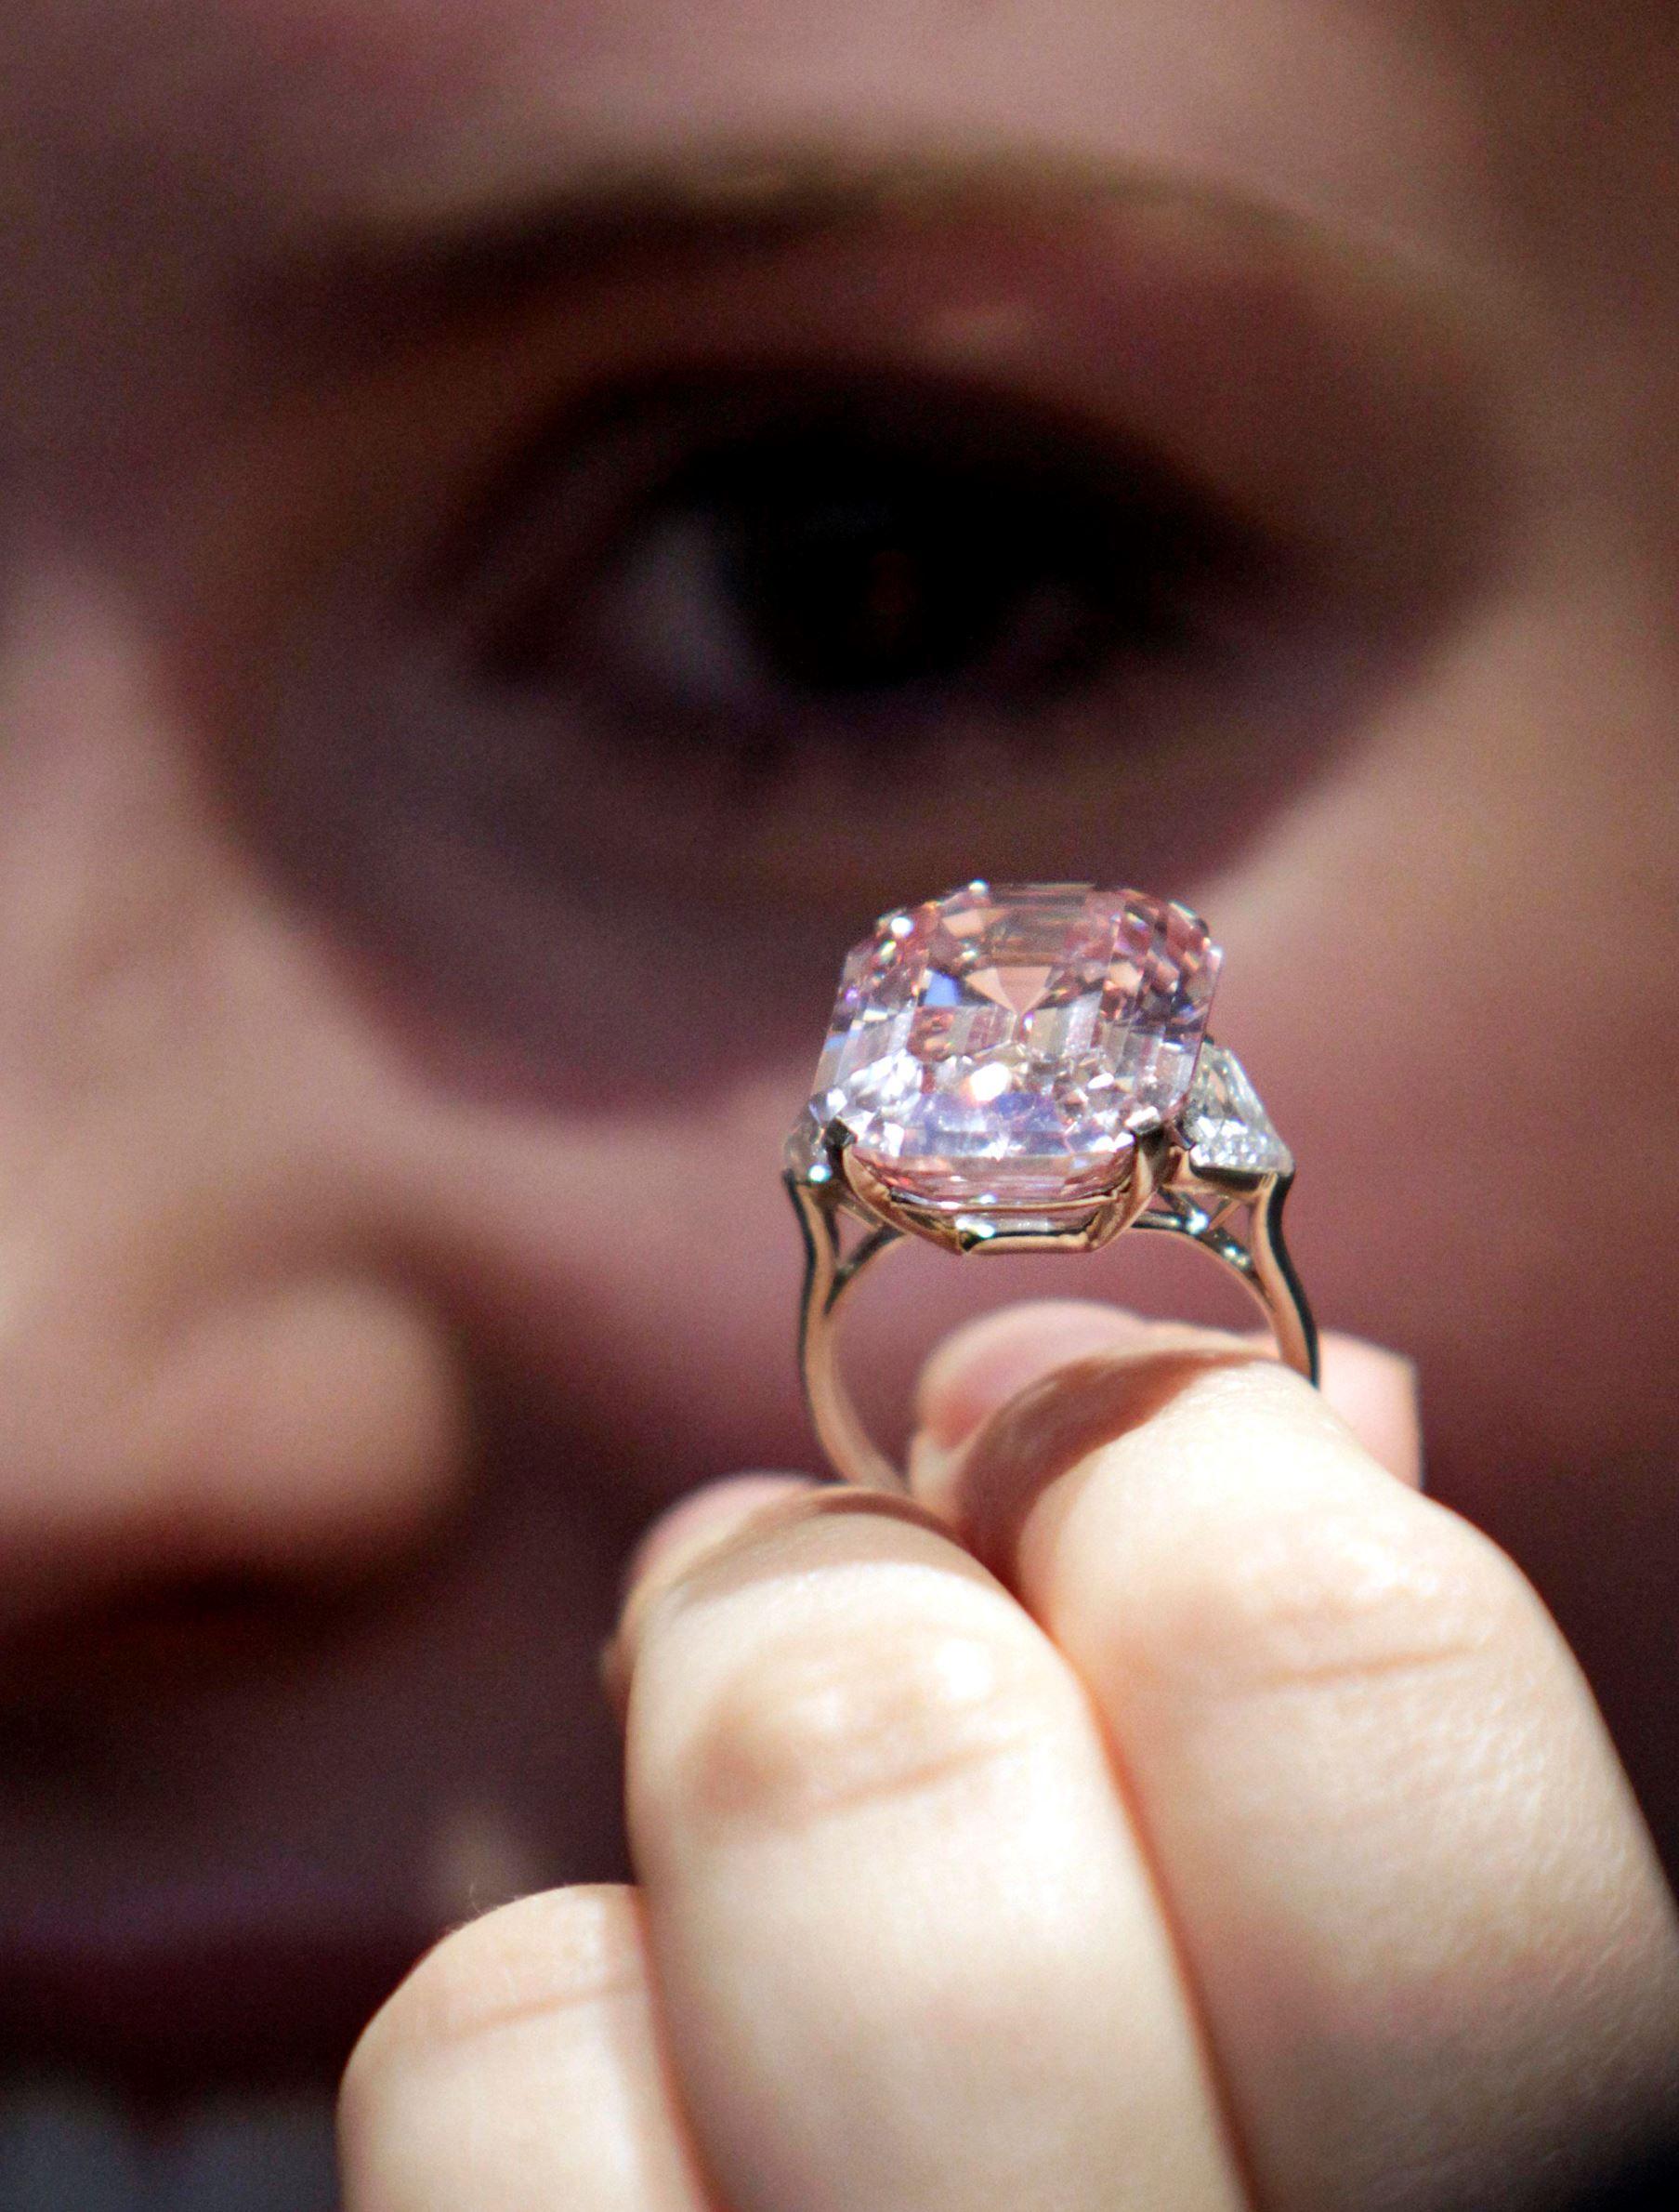 Million Dollar Stones: Most Expensive Jewellery In The World  Million  Dollar Stones Most Expensive Jewellery In The World  Pinterest   Jewellery,